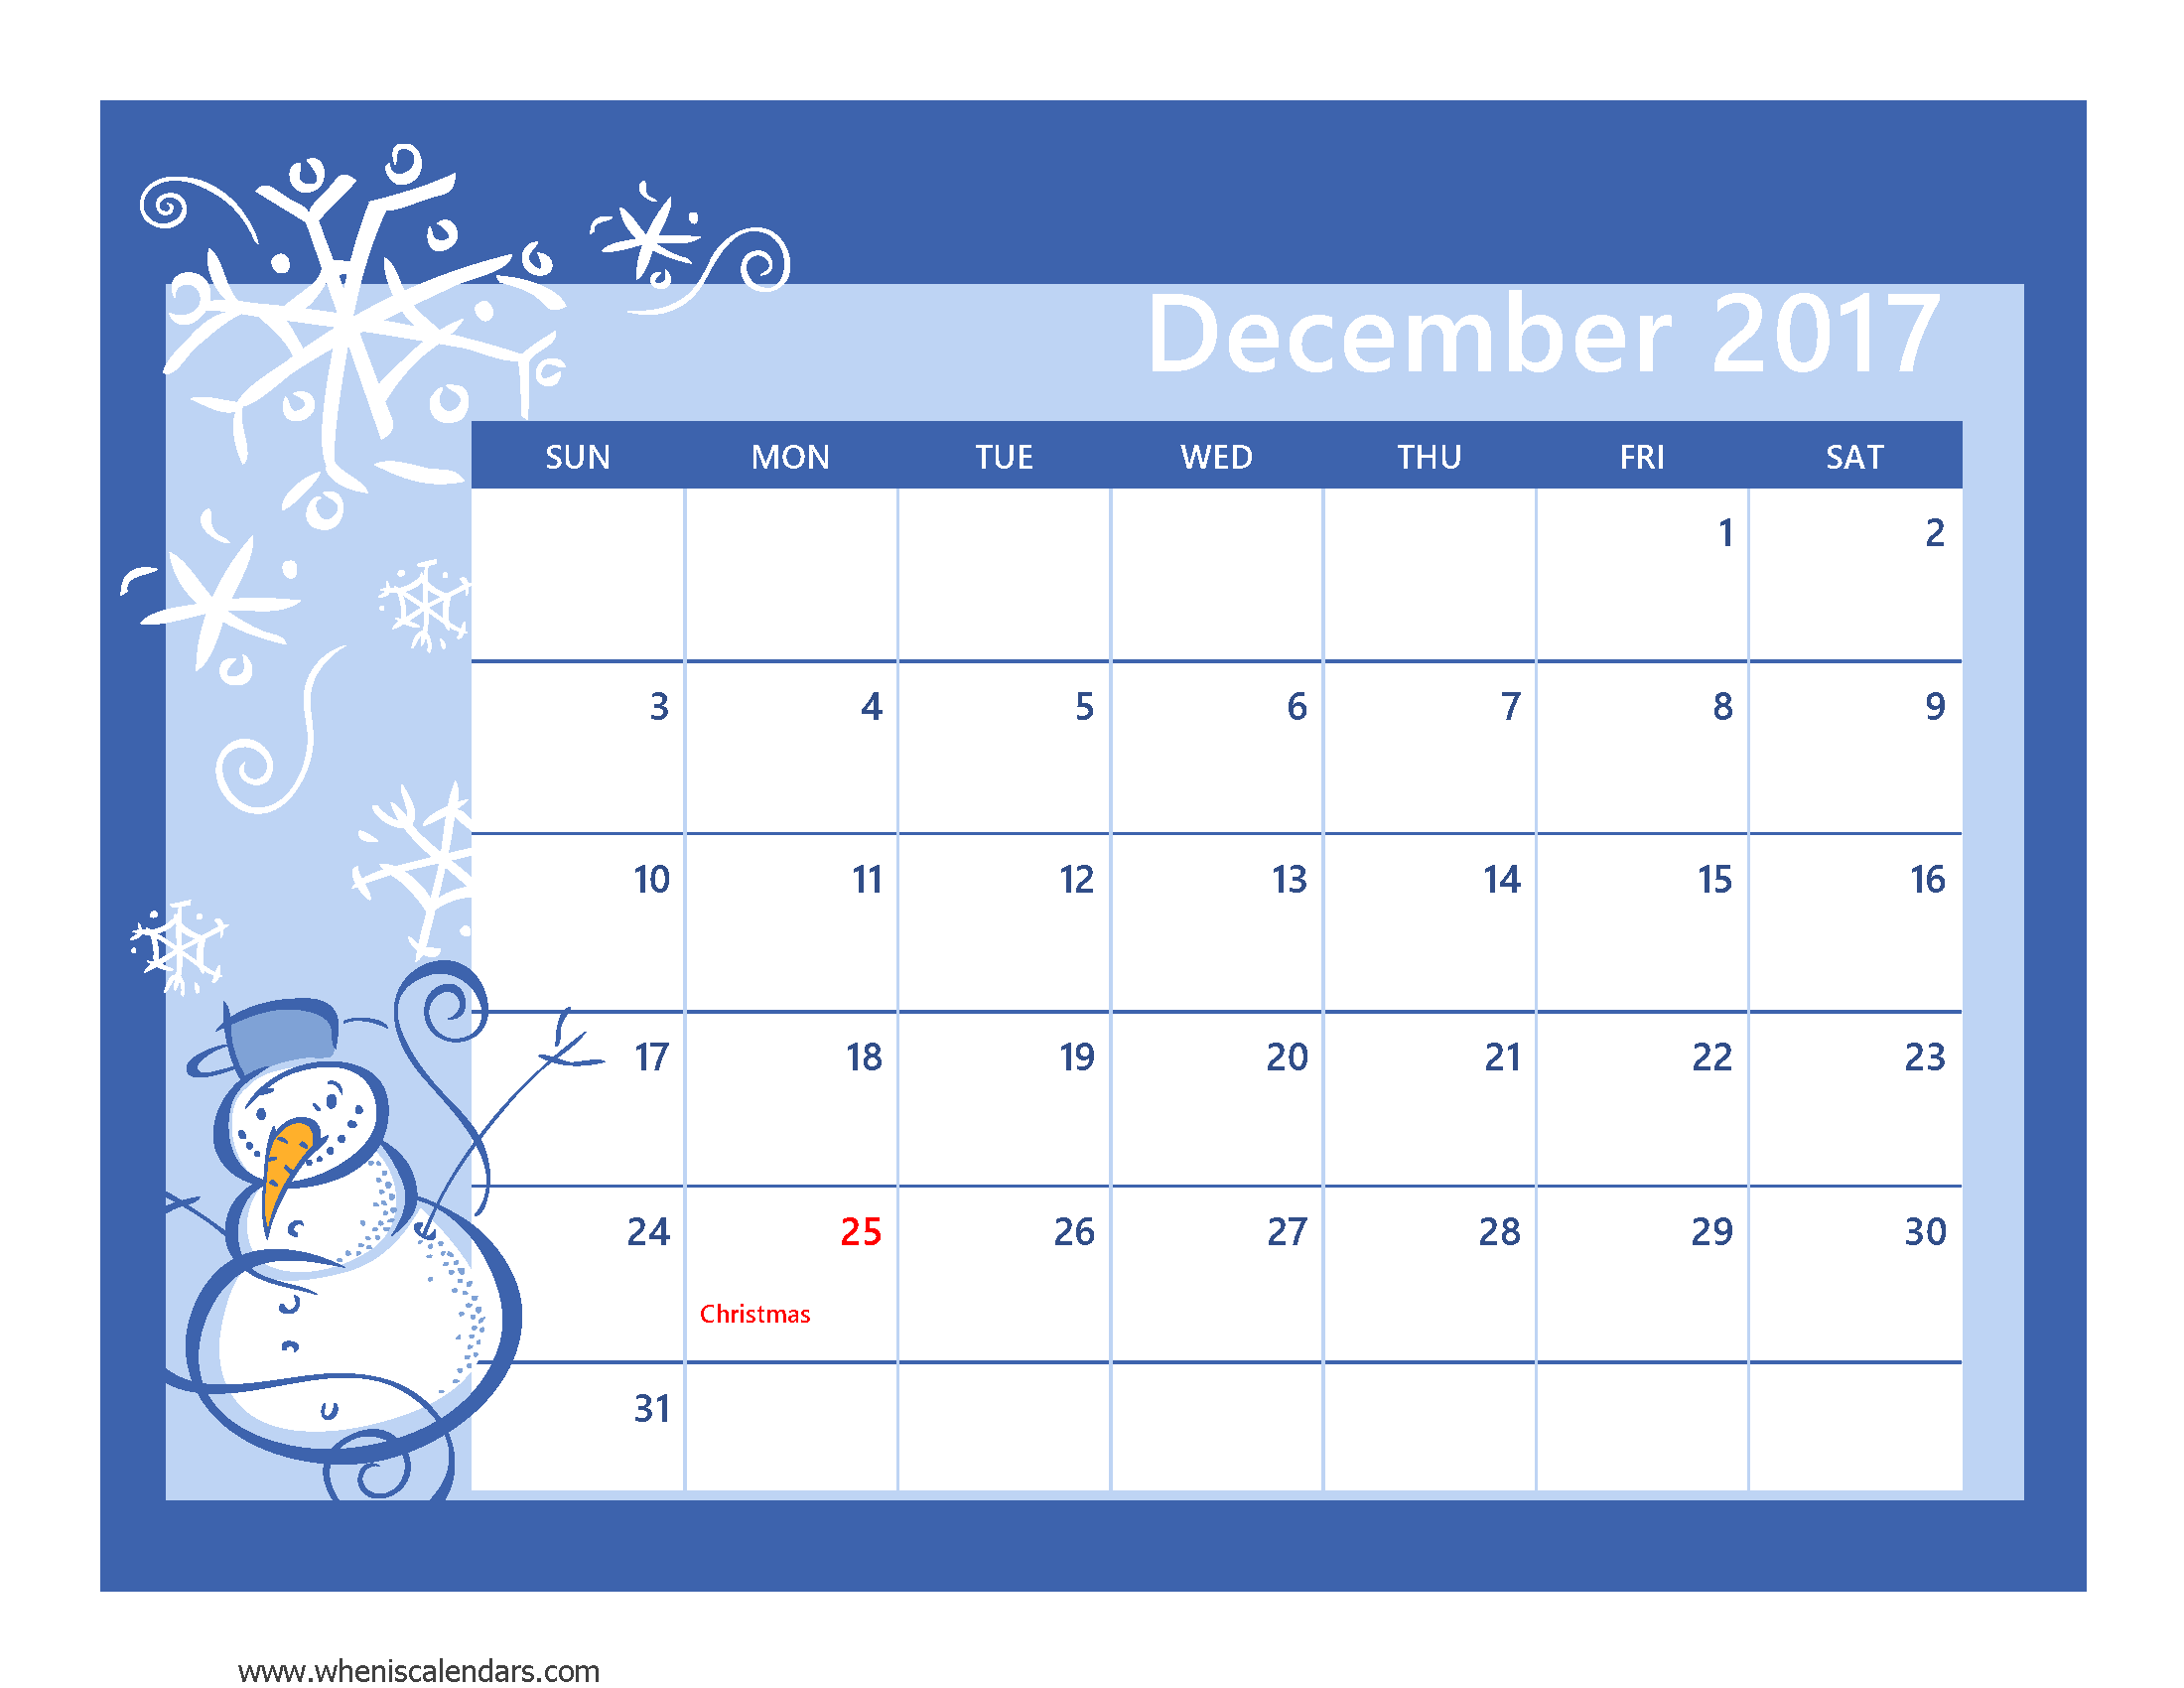 December 2017 Calendar Printable With Holidays December 2017